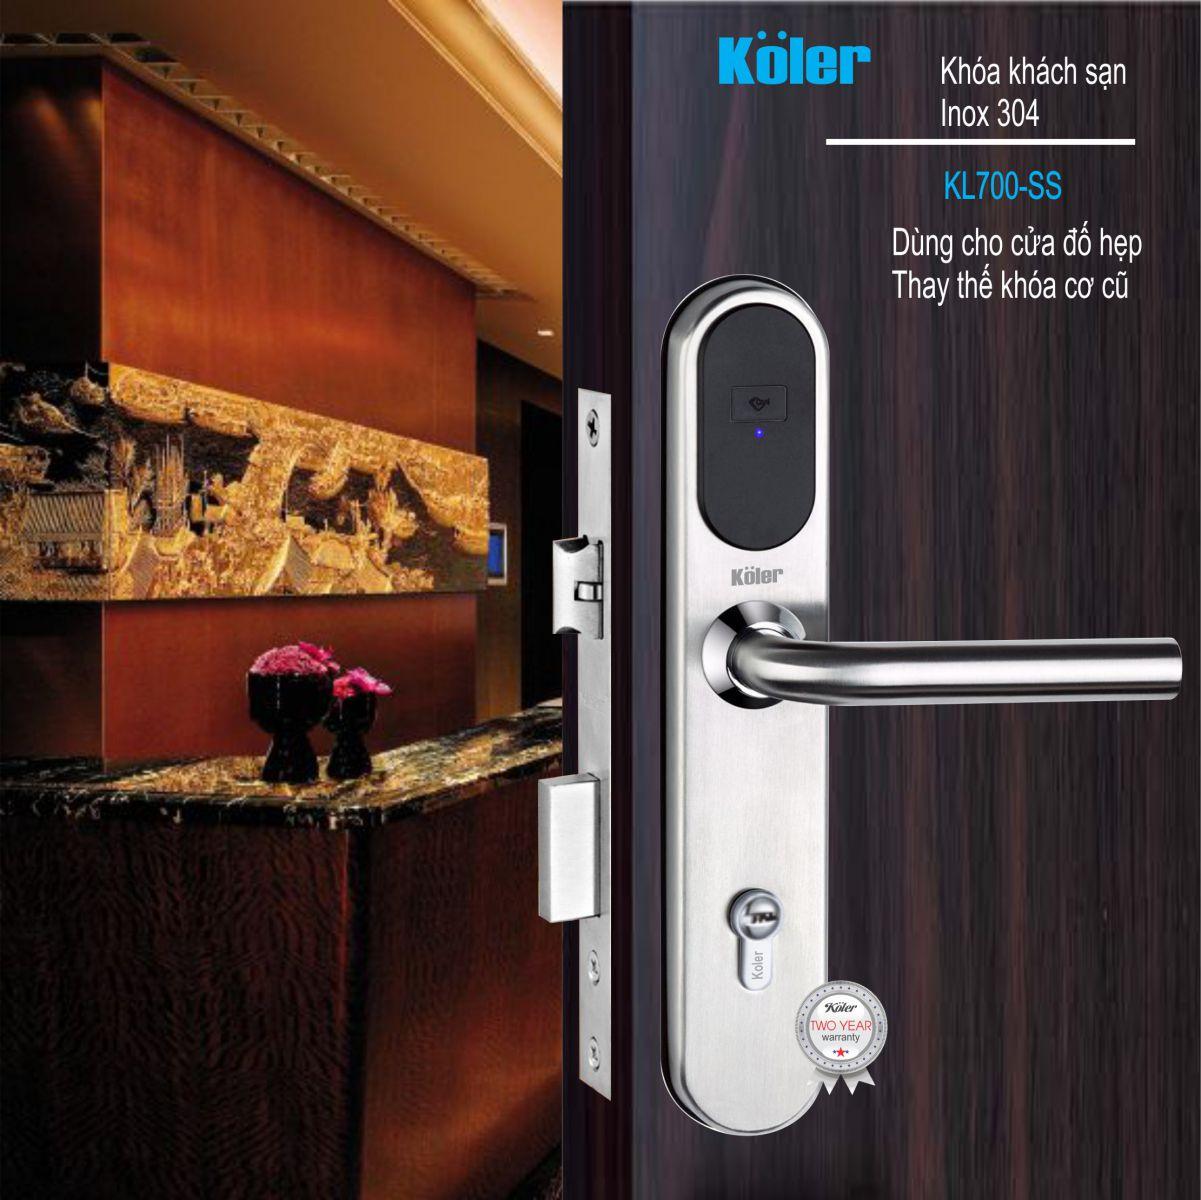 Khóa khách sạn Koler-germany KL700-SS